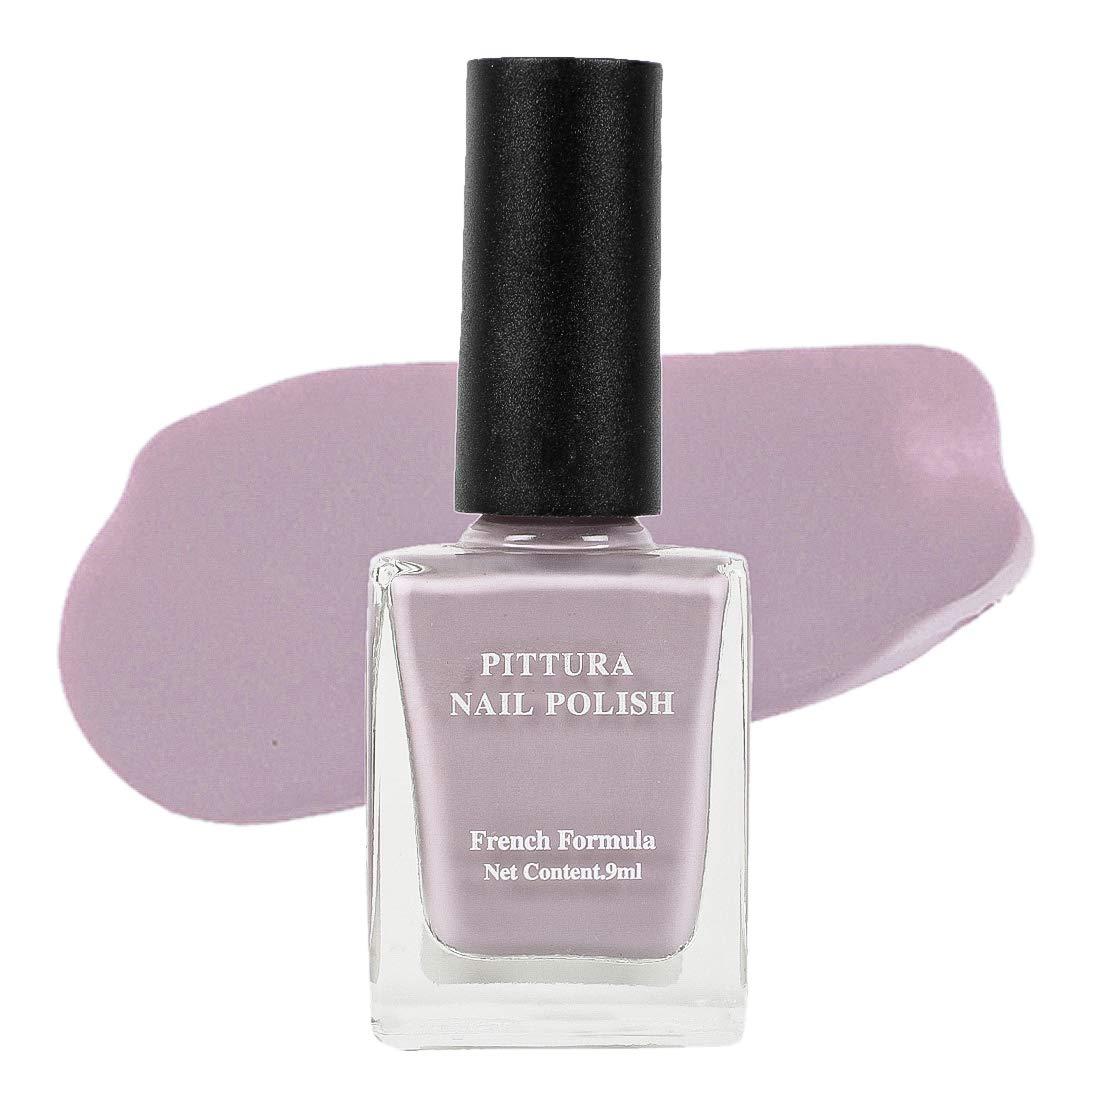 Miniso Pittura Nail Polishes Long Lasting Nail Paint 07 Gray Violet Amazon In Beauty